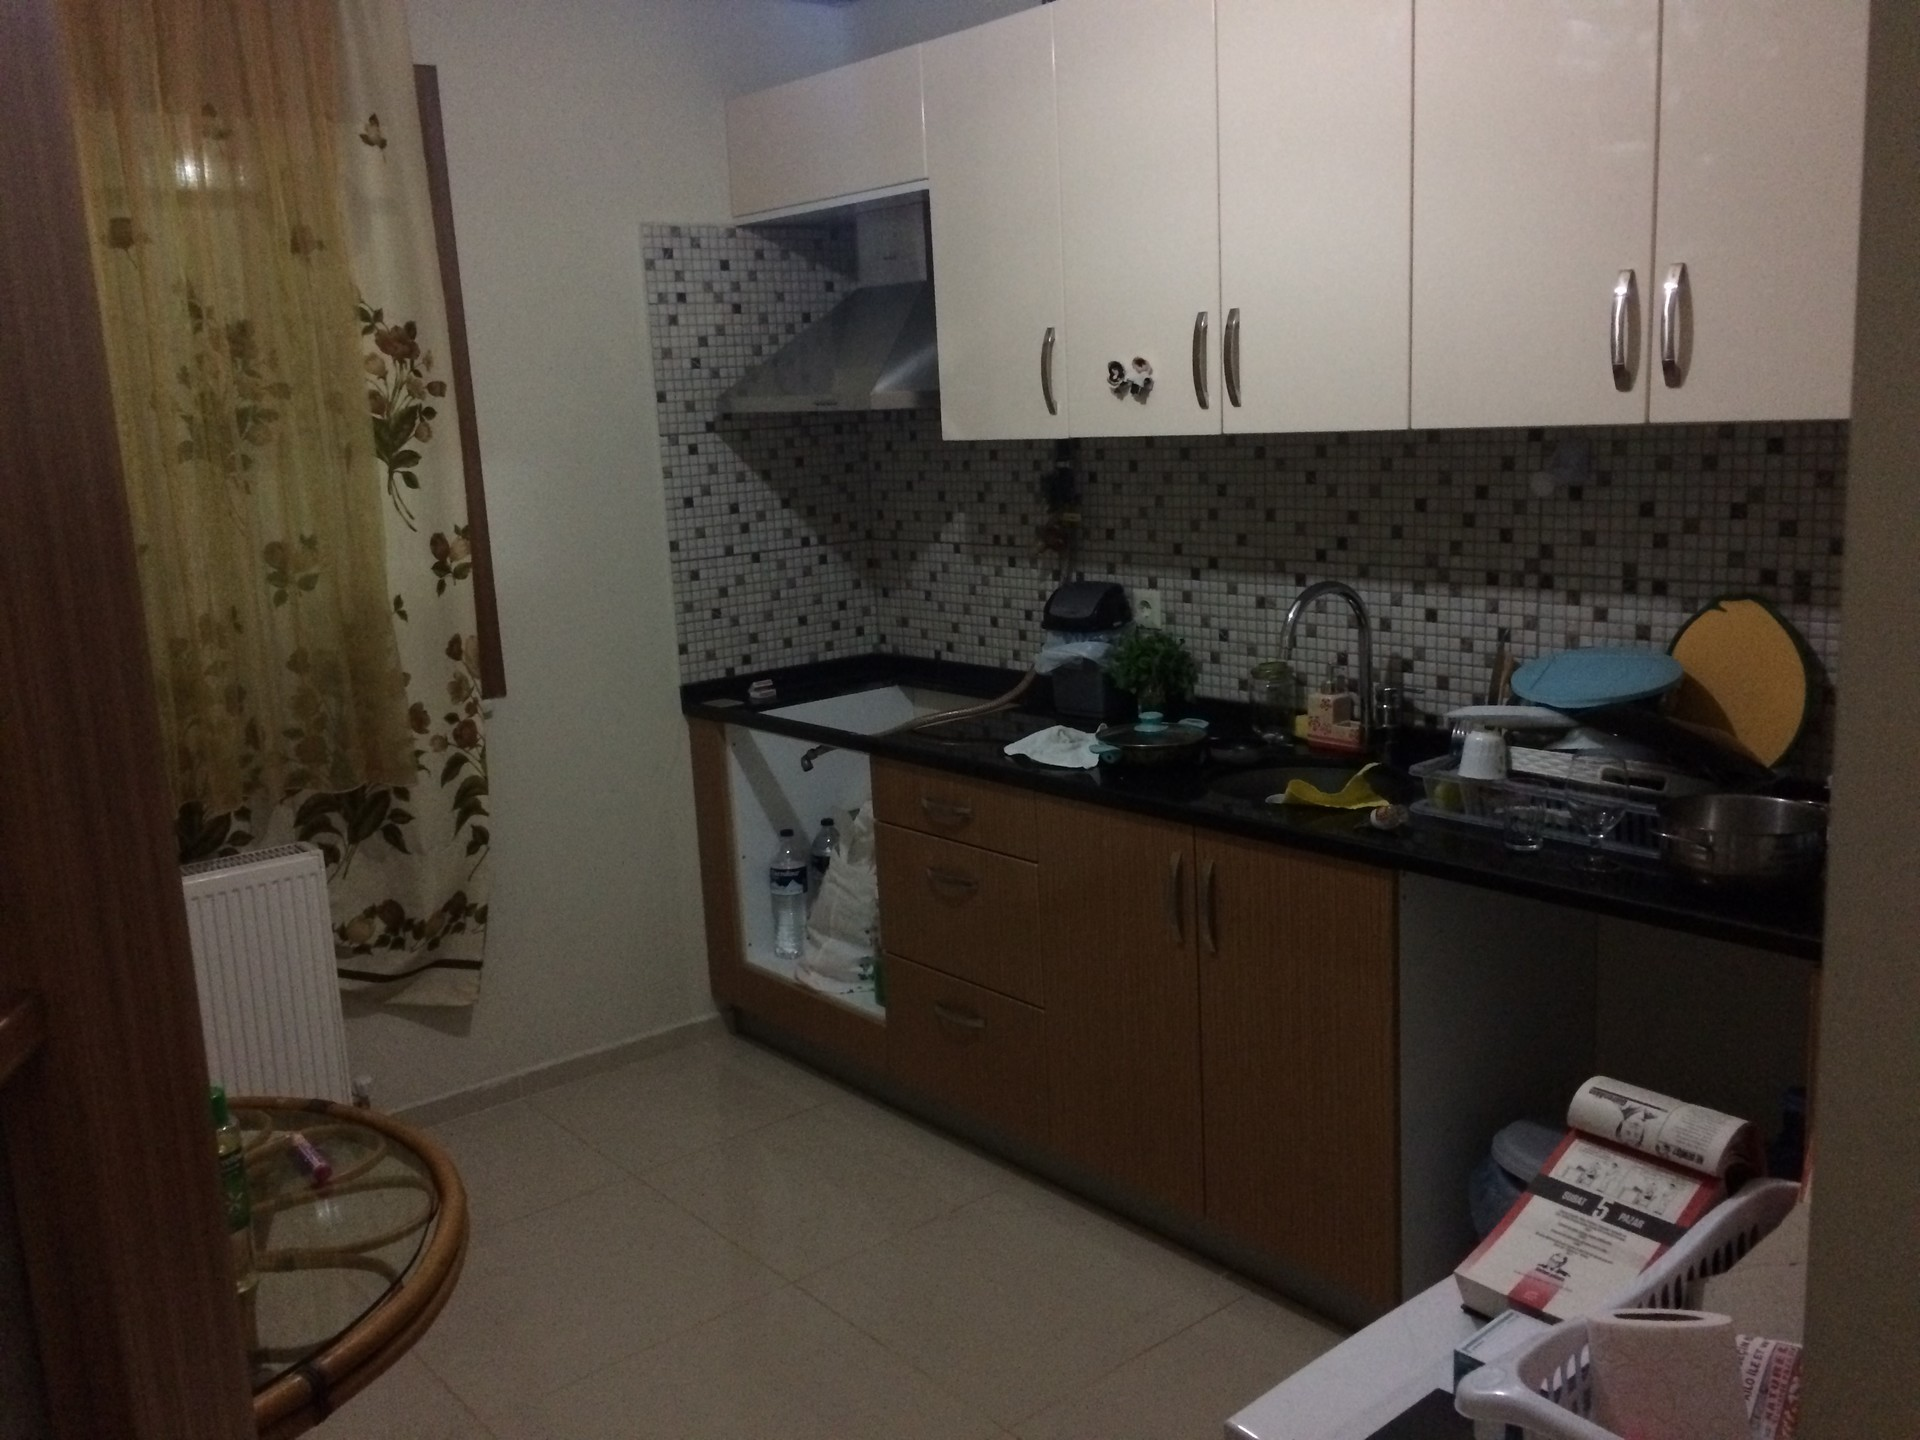 cozy-rooms-close-kadikoy-cfee644cbb79f48f0f2774dbd5bb2f34